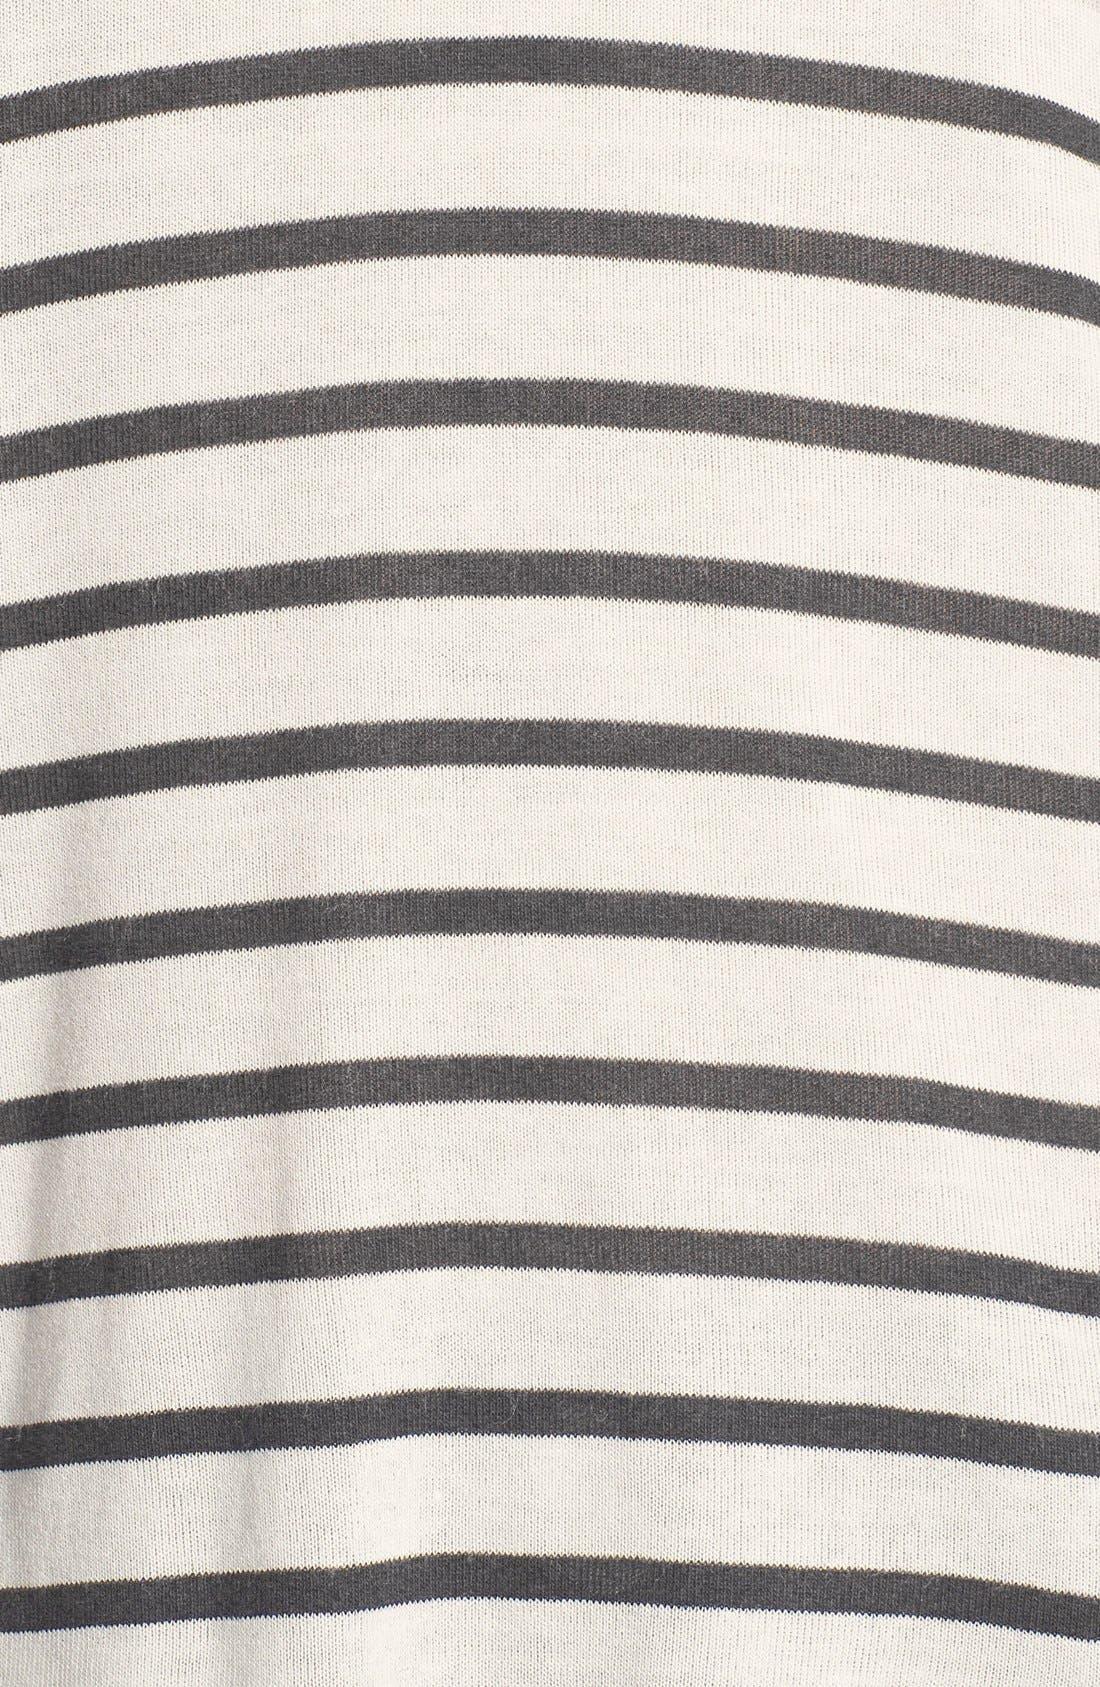 Alternate Image 3  - Splendid Stripe Scoop Neck Top